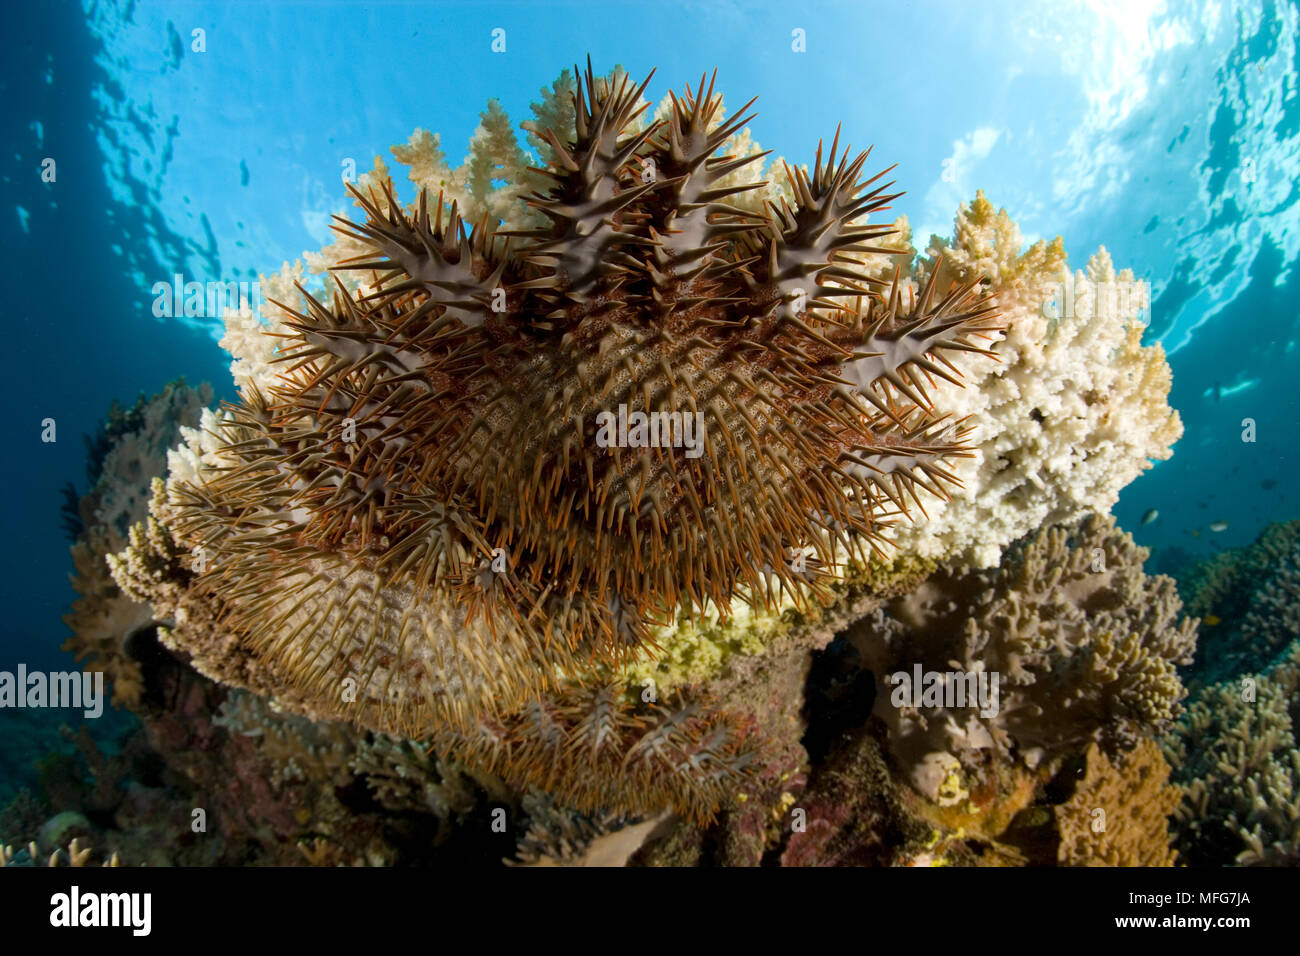 Crown-of-Thorns, Acanthaster planci, feeding on coral, Garden Eels dive site, Menjangan Island, Bali Island, Indonesia, Pacific Ocean  Date: 22.07.08 - Stock Image